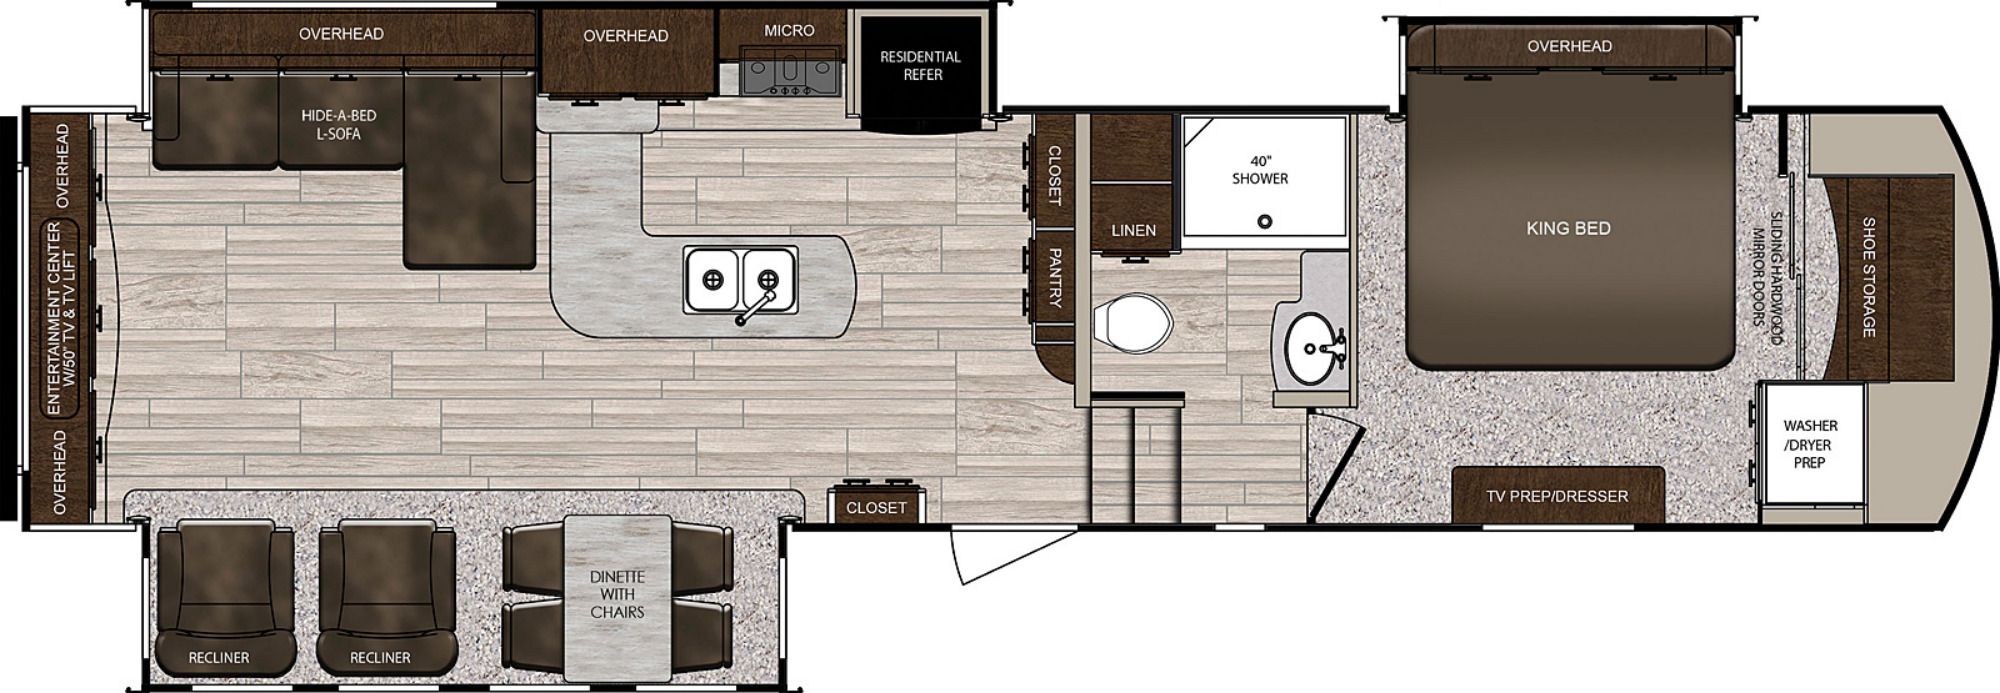 View Floor Plan for 2021 PRIME TIME SANIBEL 3402WB